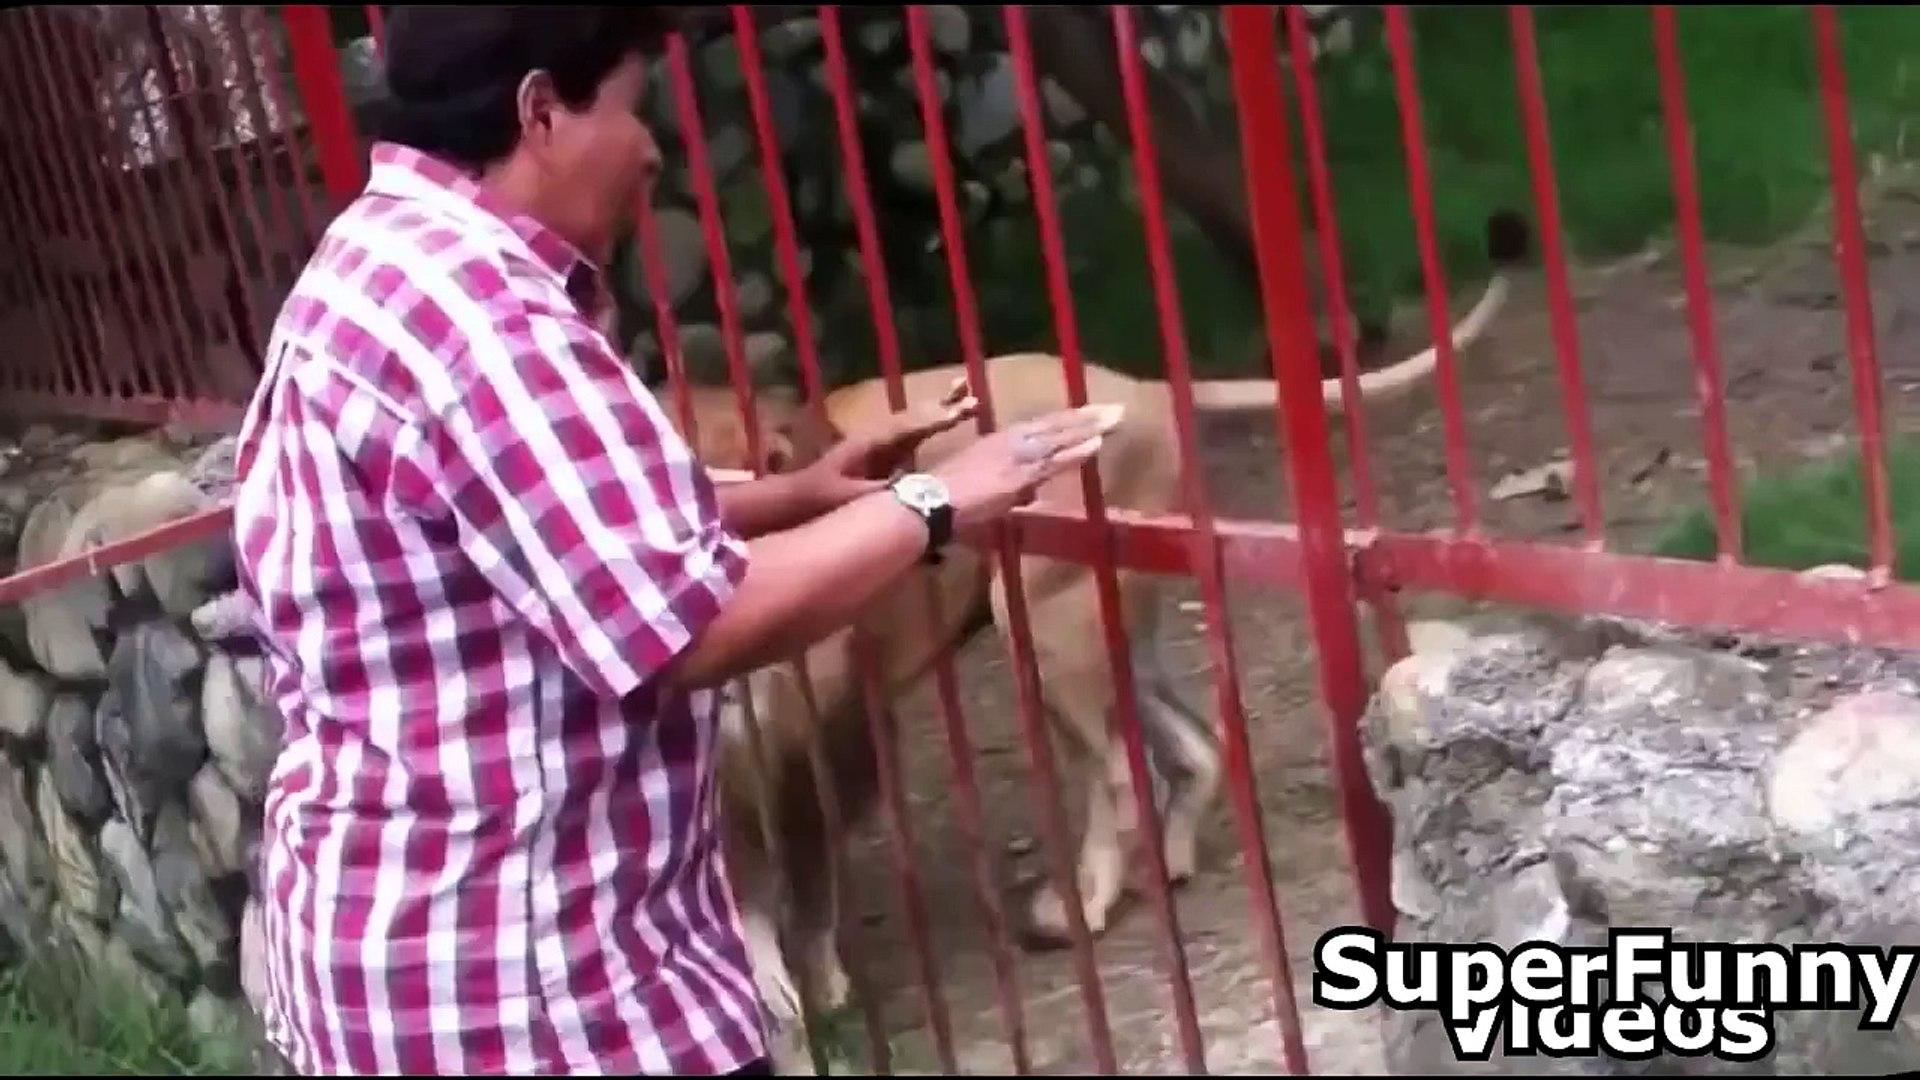 Cute Animal Videos Compilation 2015 - Cute Funny Videos Animals 2015